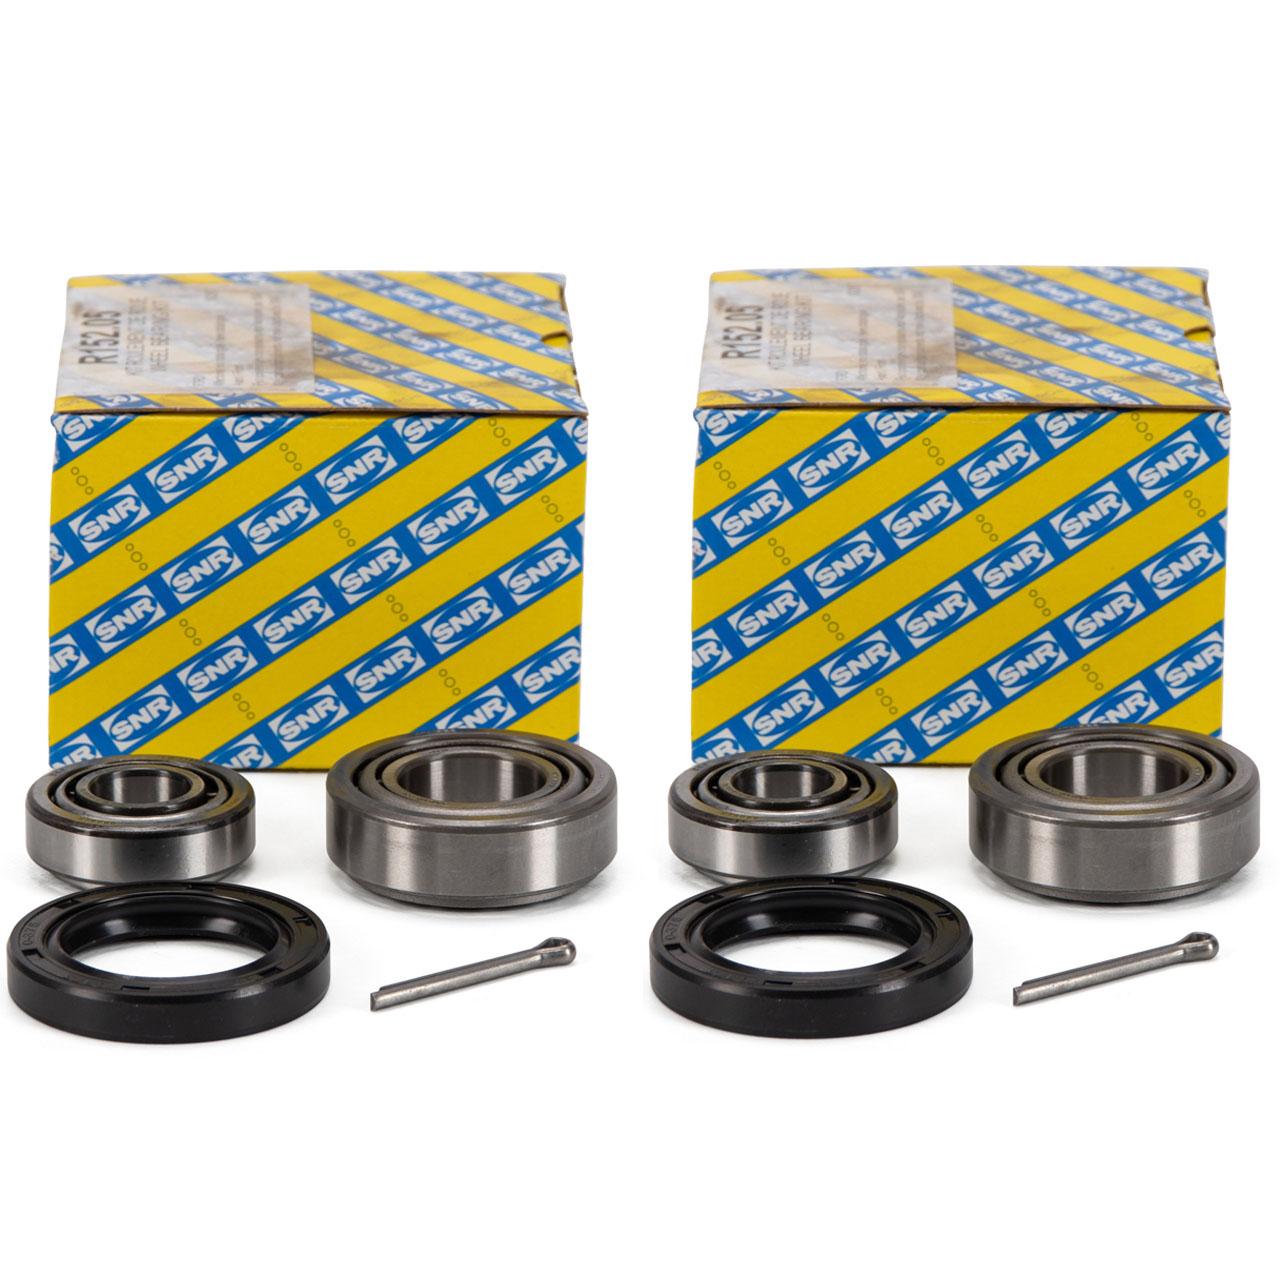 2x SNR R152.05 Radlagersatz FORD Capri 2 3 1.6-2.8i Turbo Escort 2 2.0 RS vorne